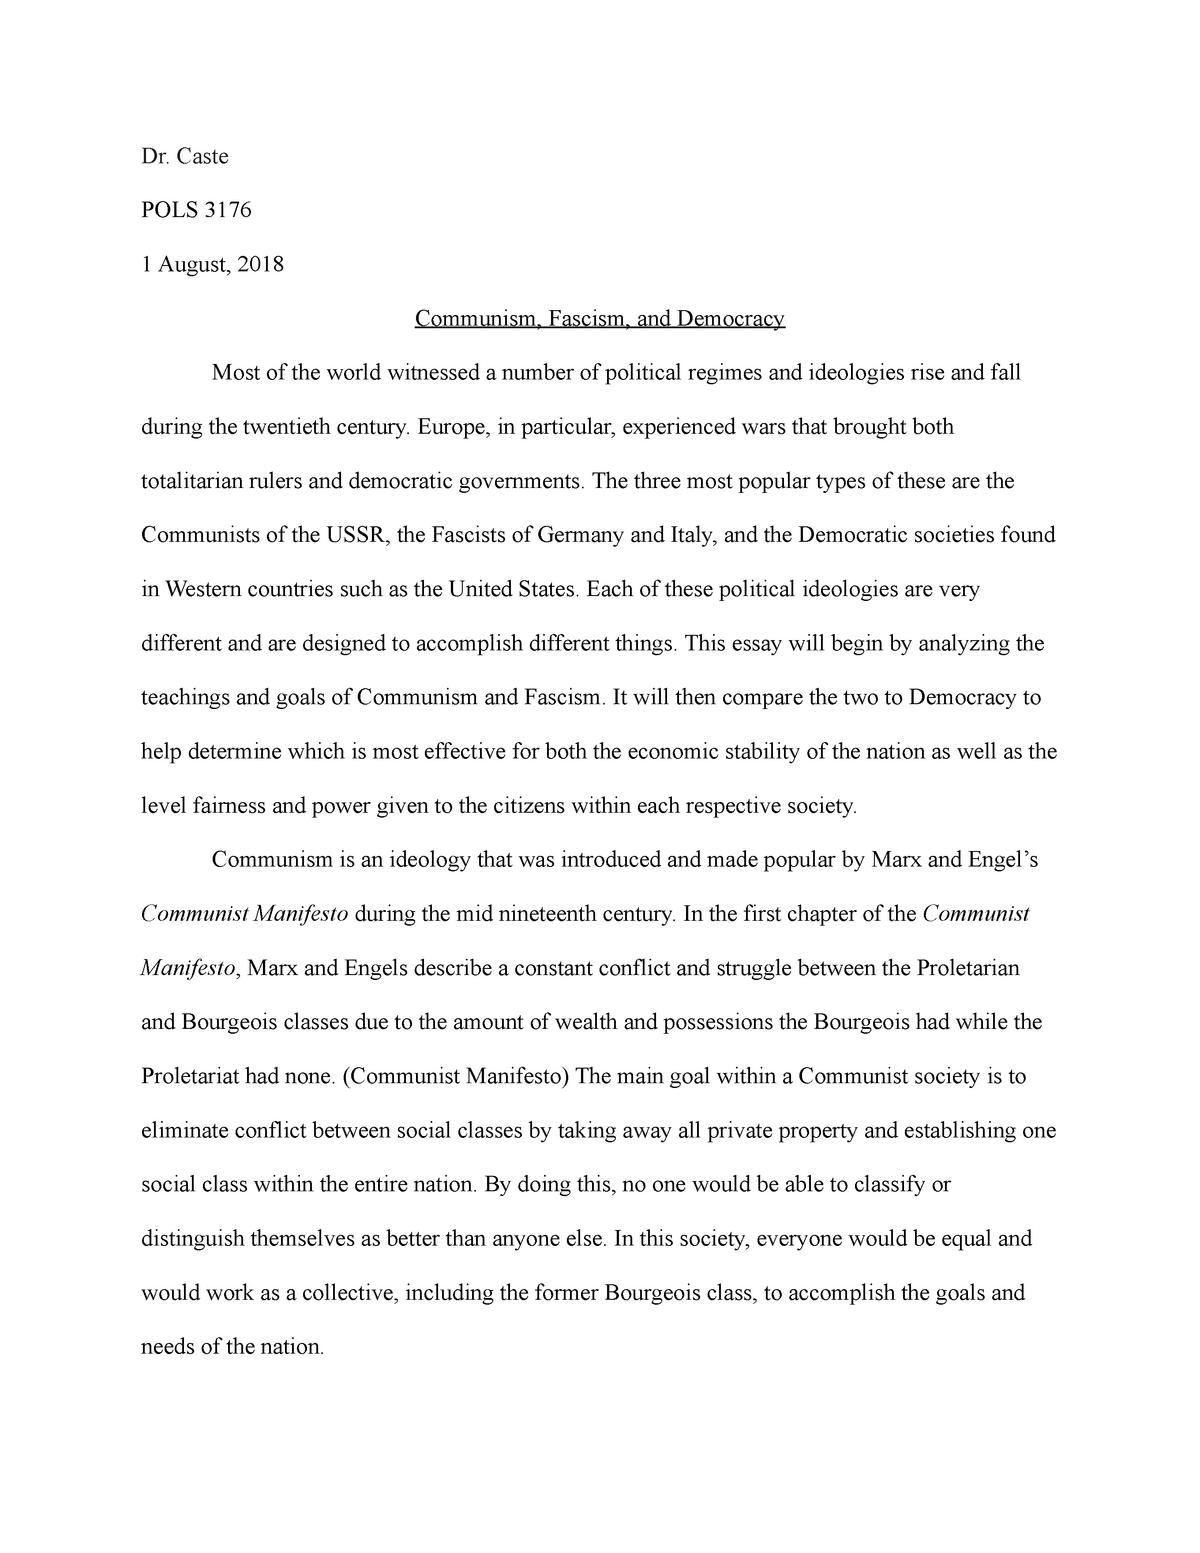 communist manifesto essay questions